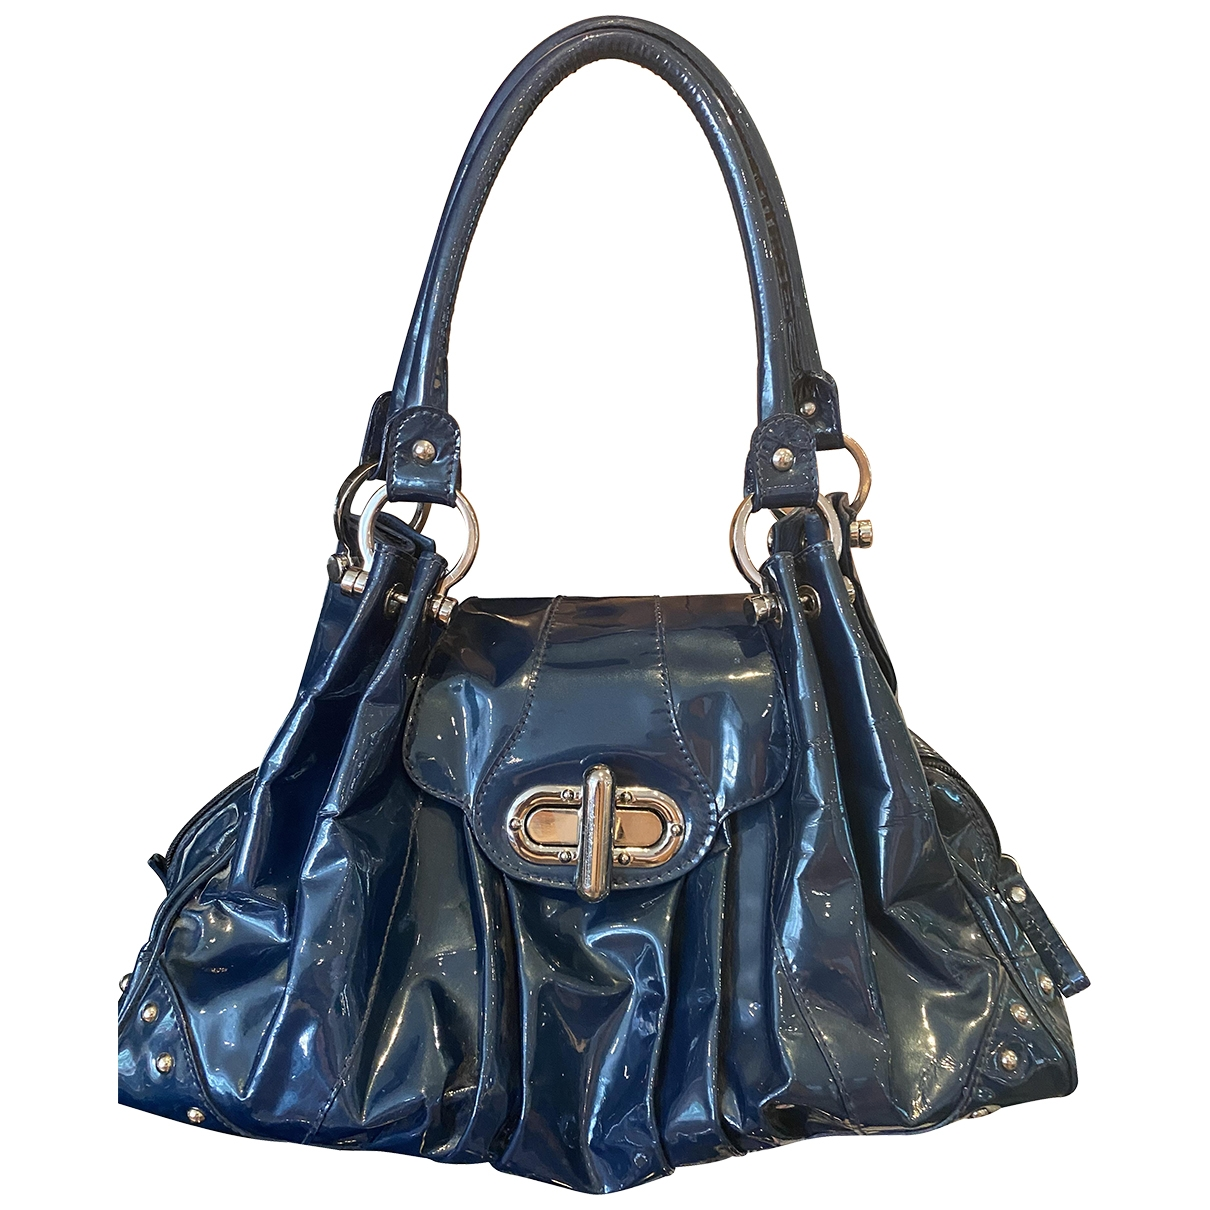 Russell & Bromley \N Handtasche in  Blau Lackleder